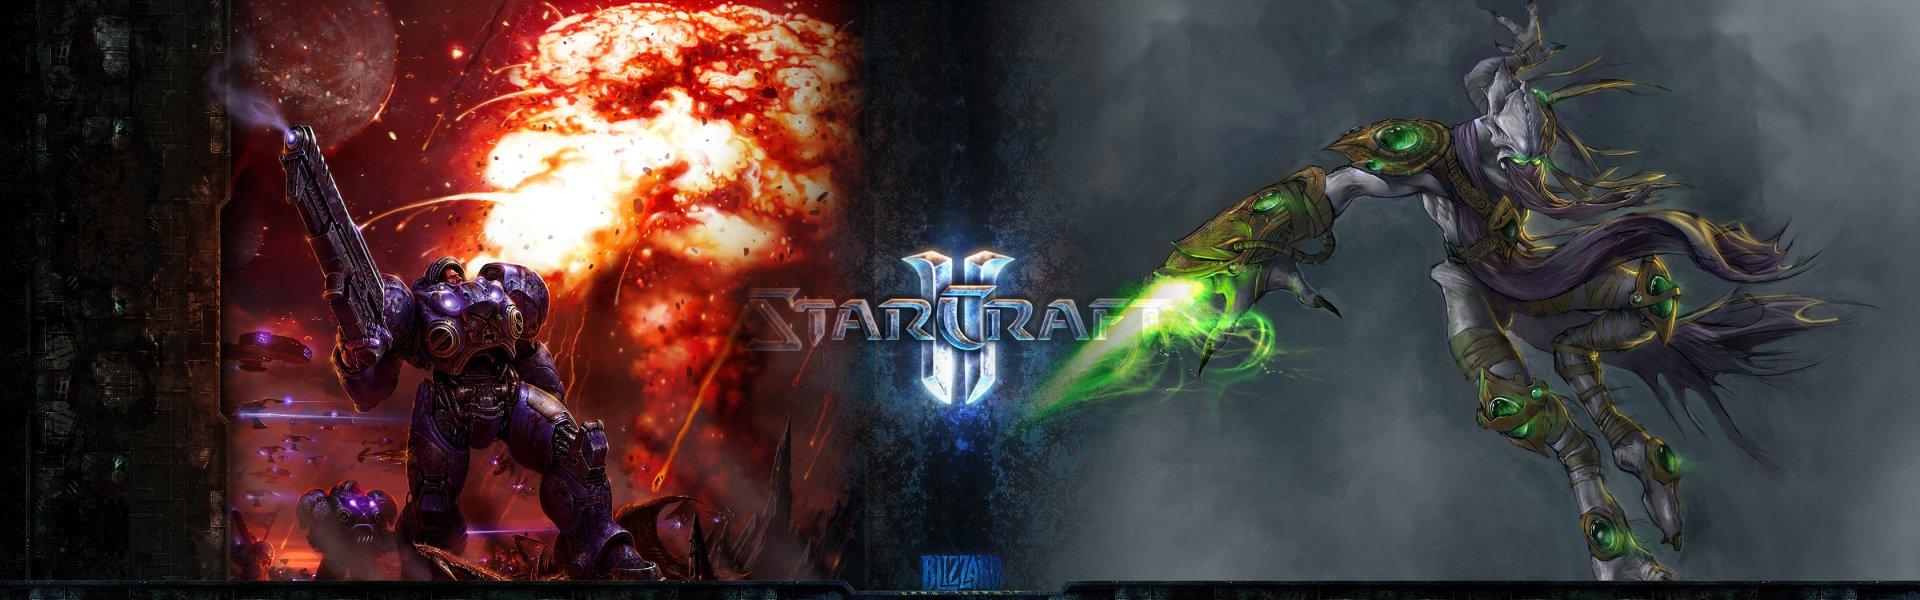 Multi Monitor - Videospiel  Starcraft II Wallpaper